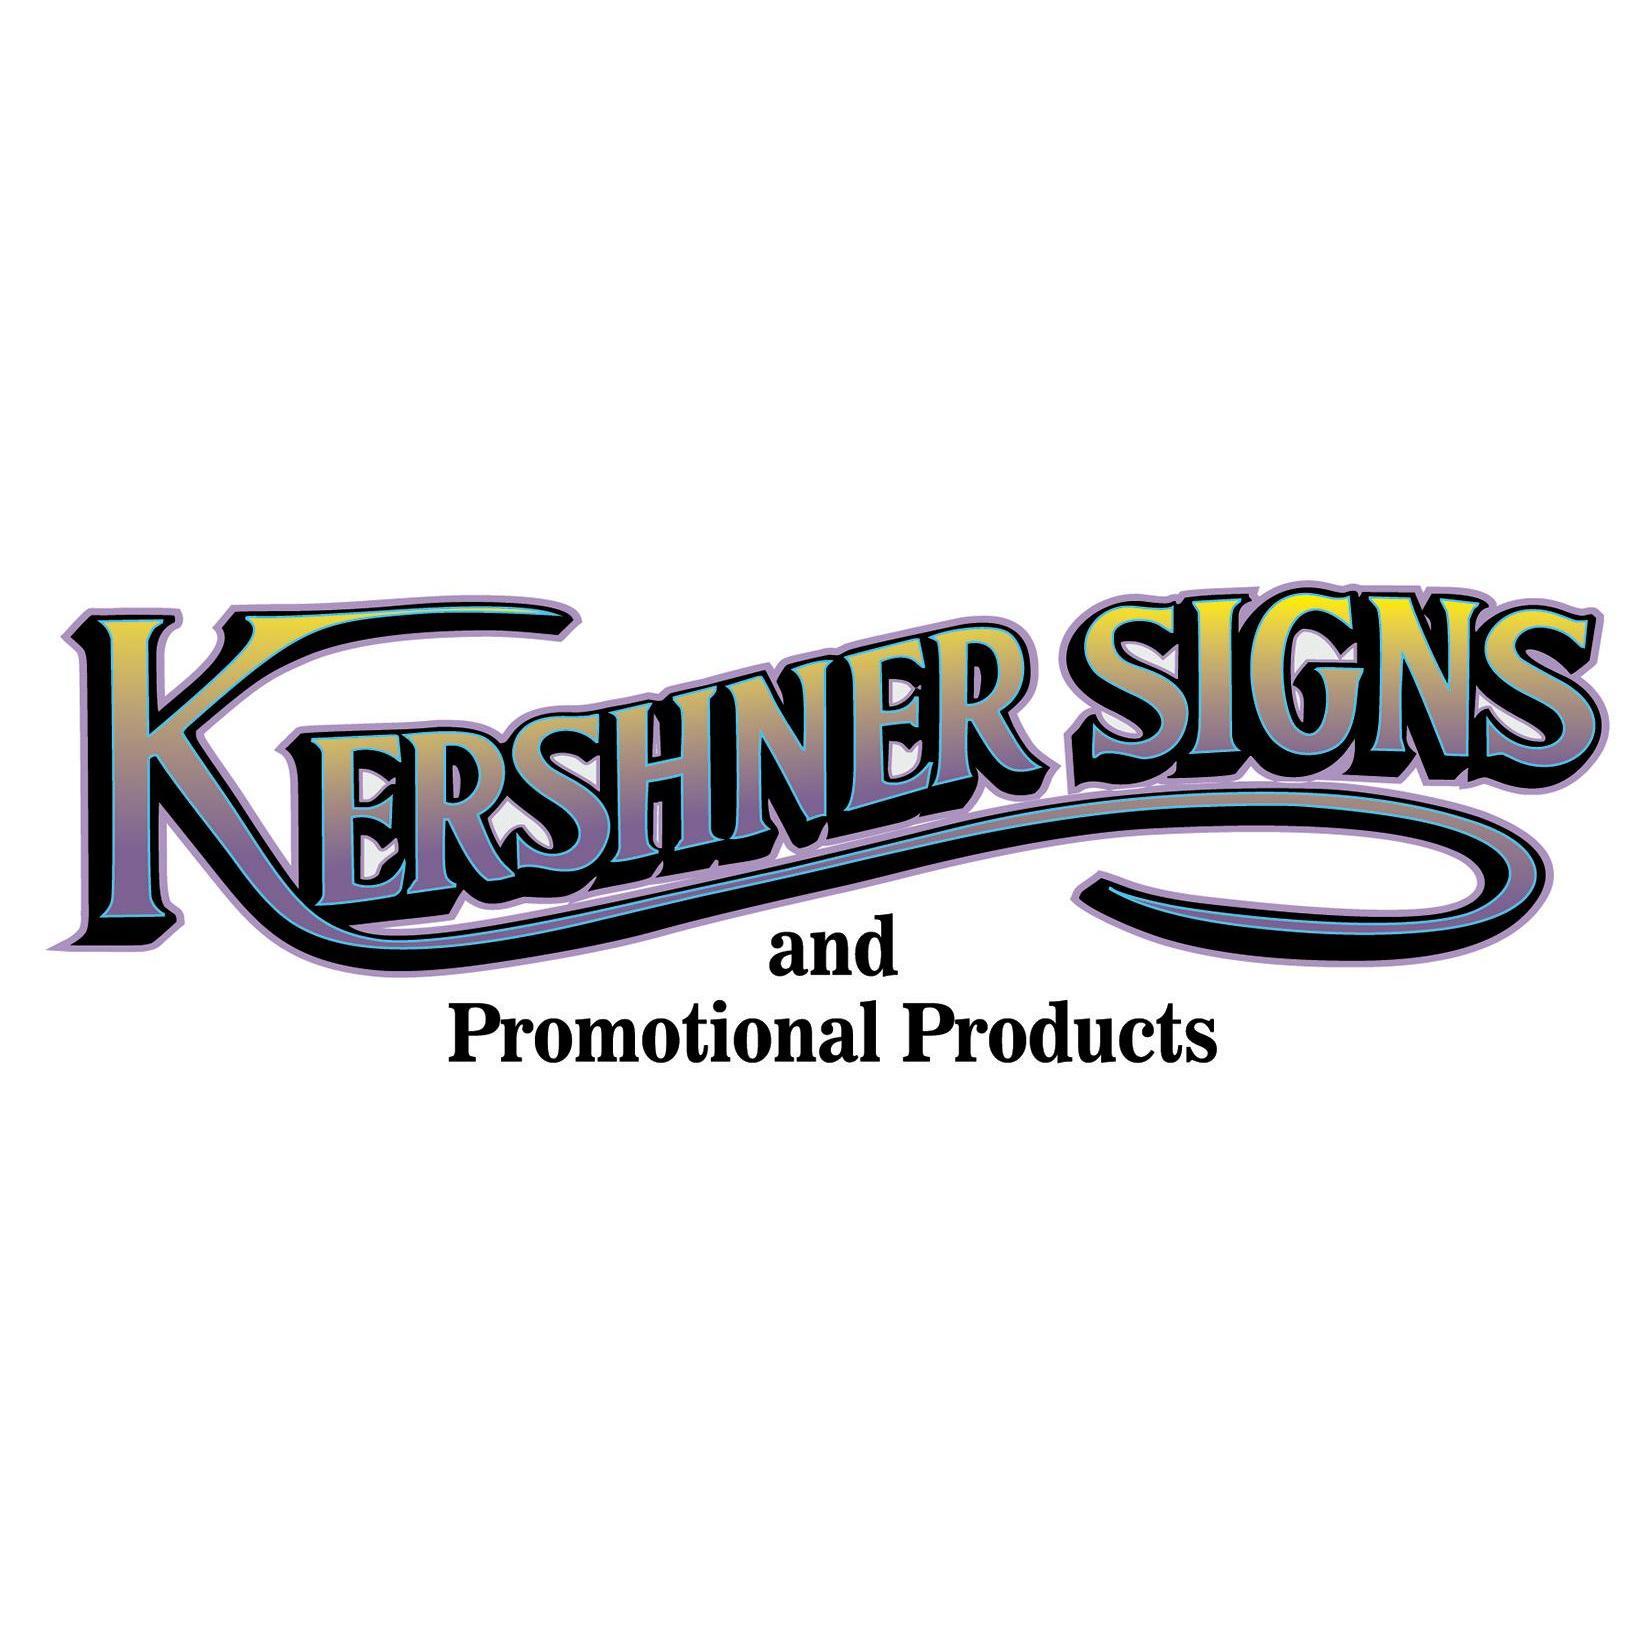 Kershner Signs